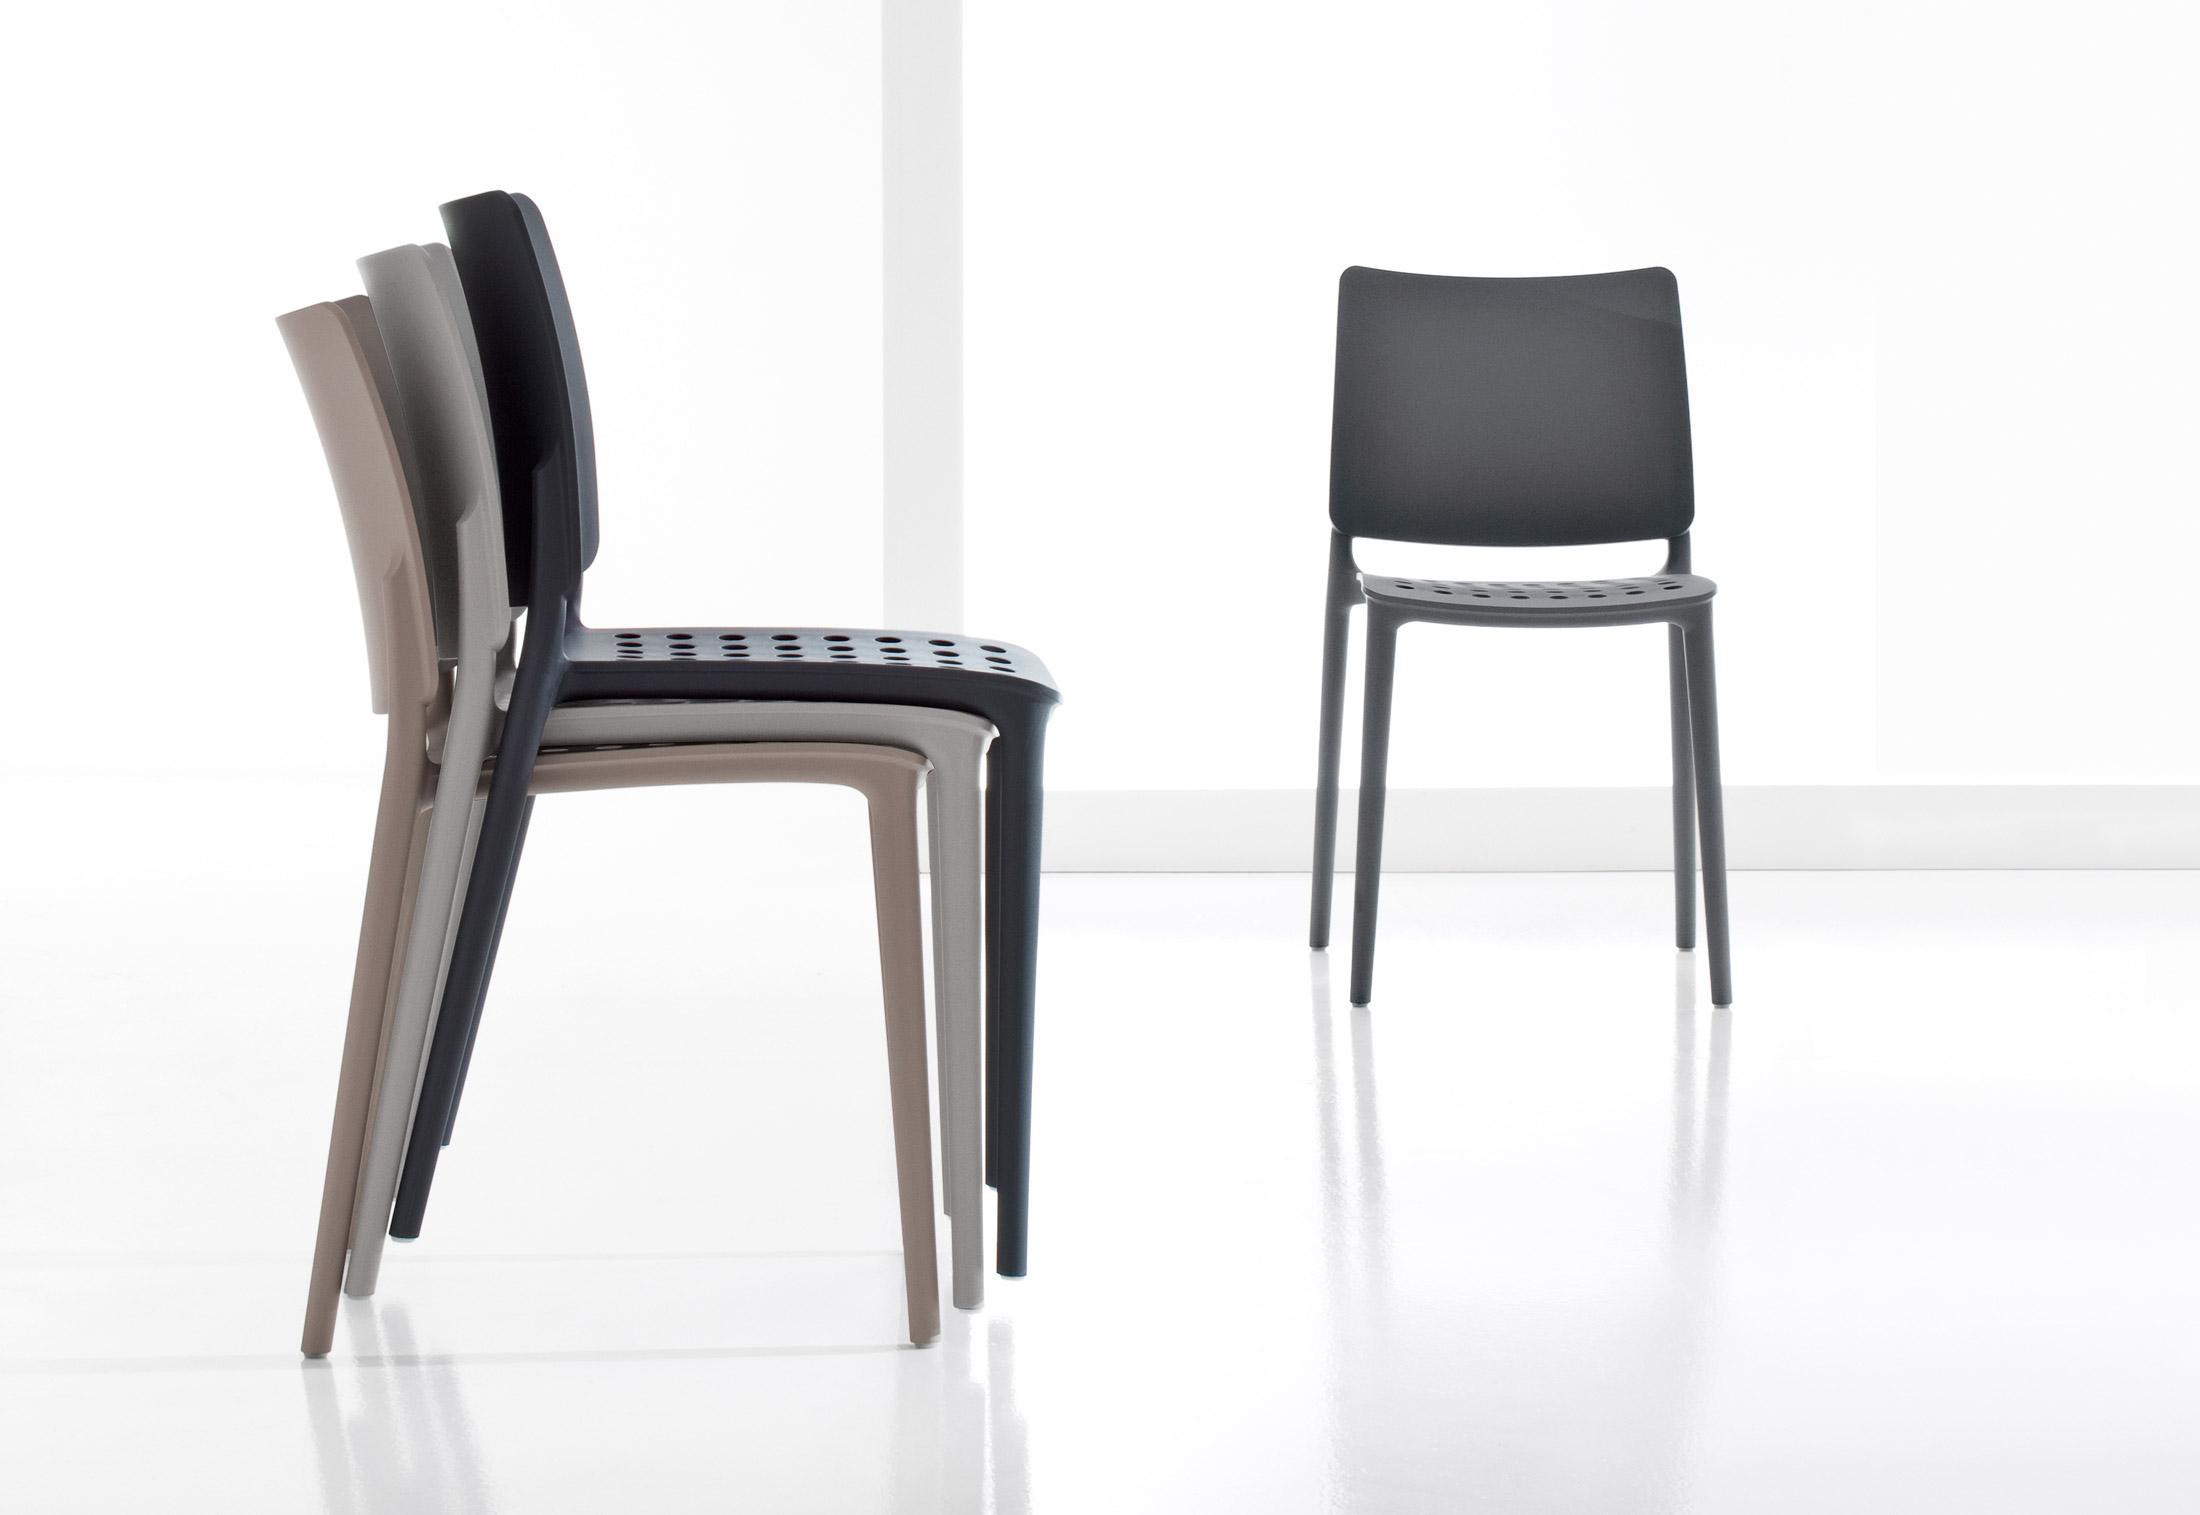 Sedie blues bonaldo sedia blues xo xoxo di bonaldo design for Sedie xo design